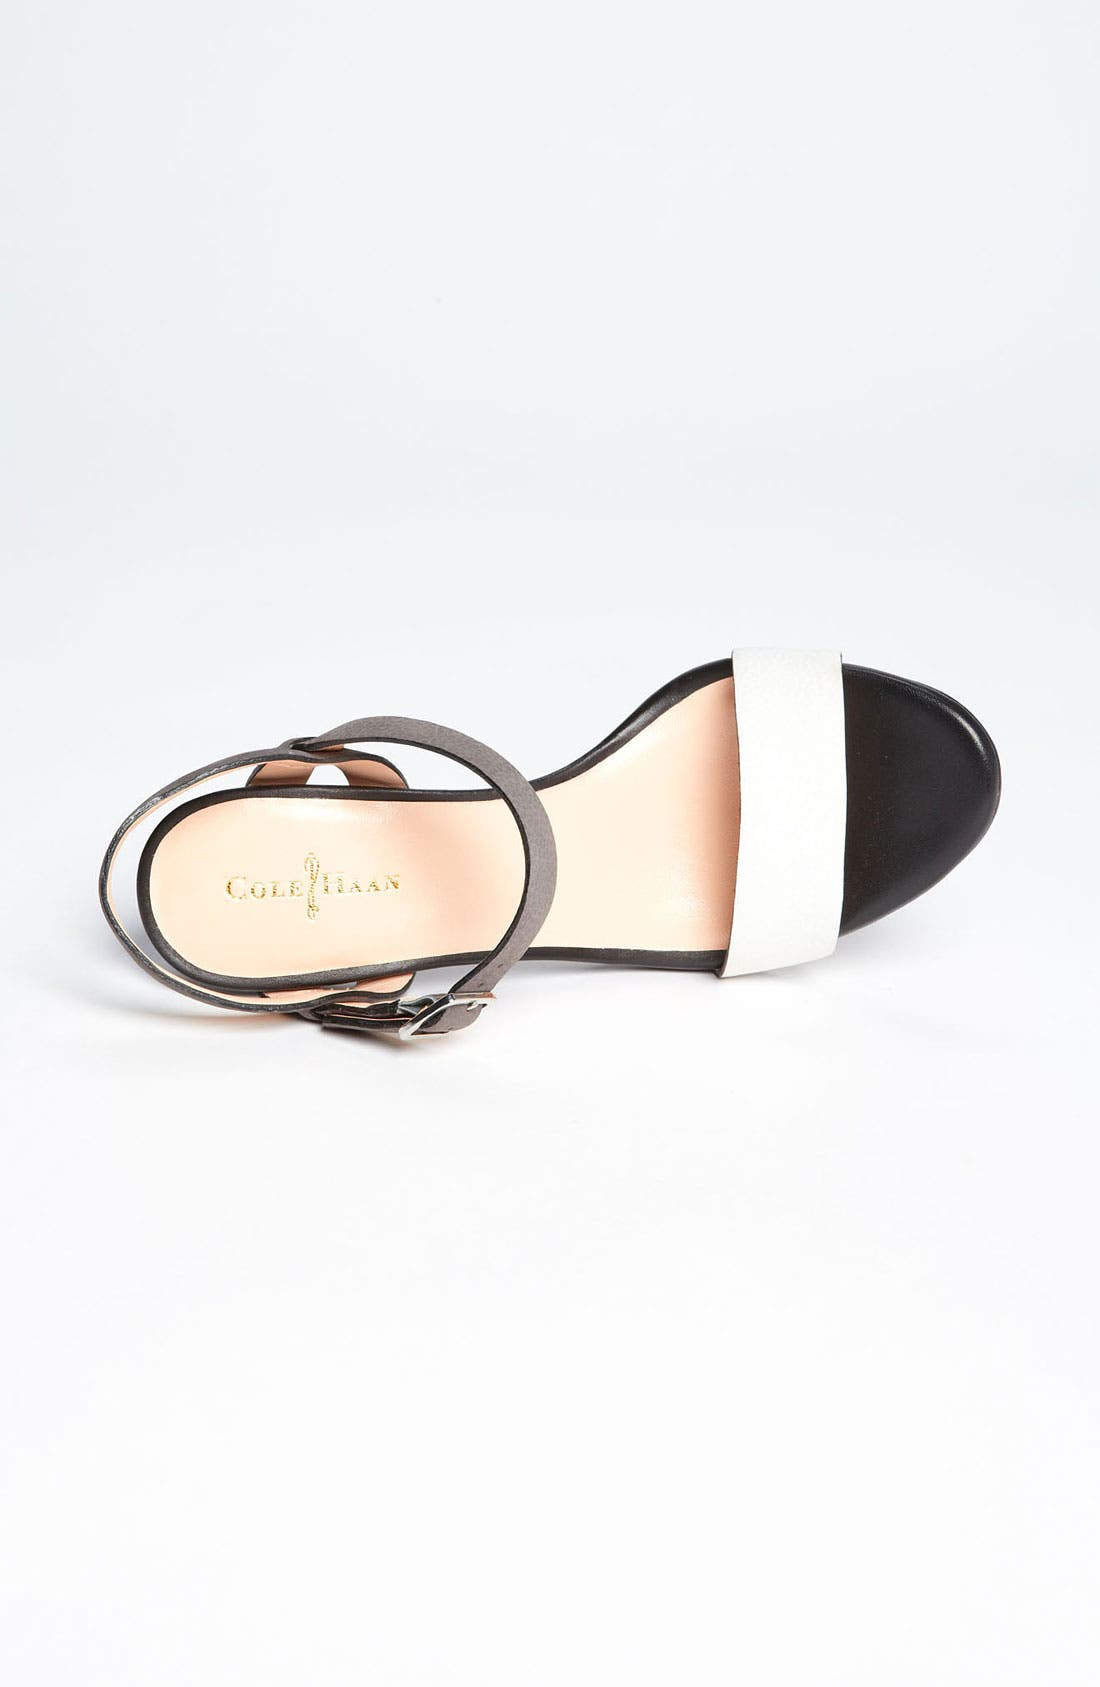 COLE HAAN,                             'Minetta' Sandal,                             Alternate thumbnail 2, color,                             020